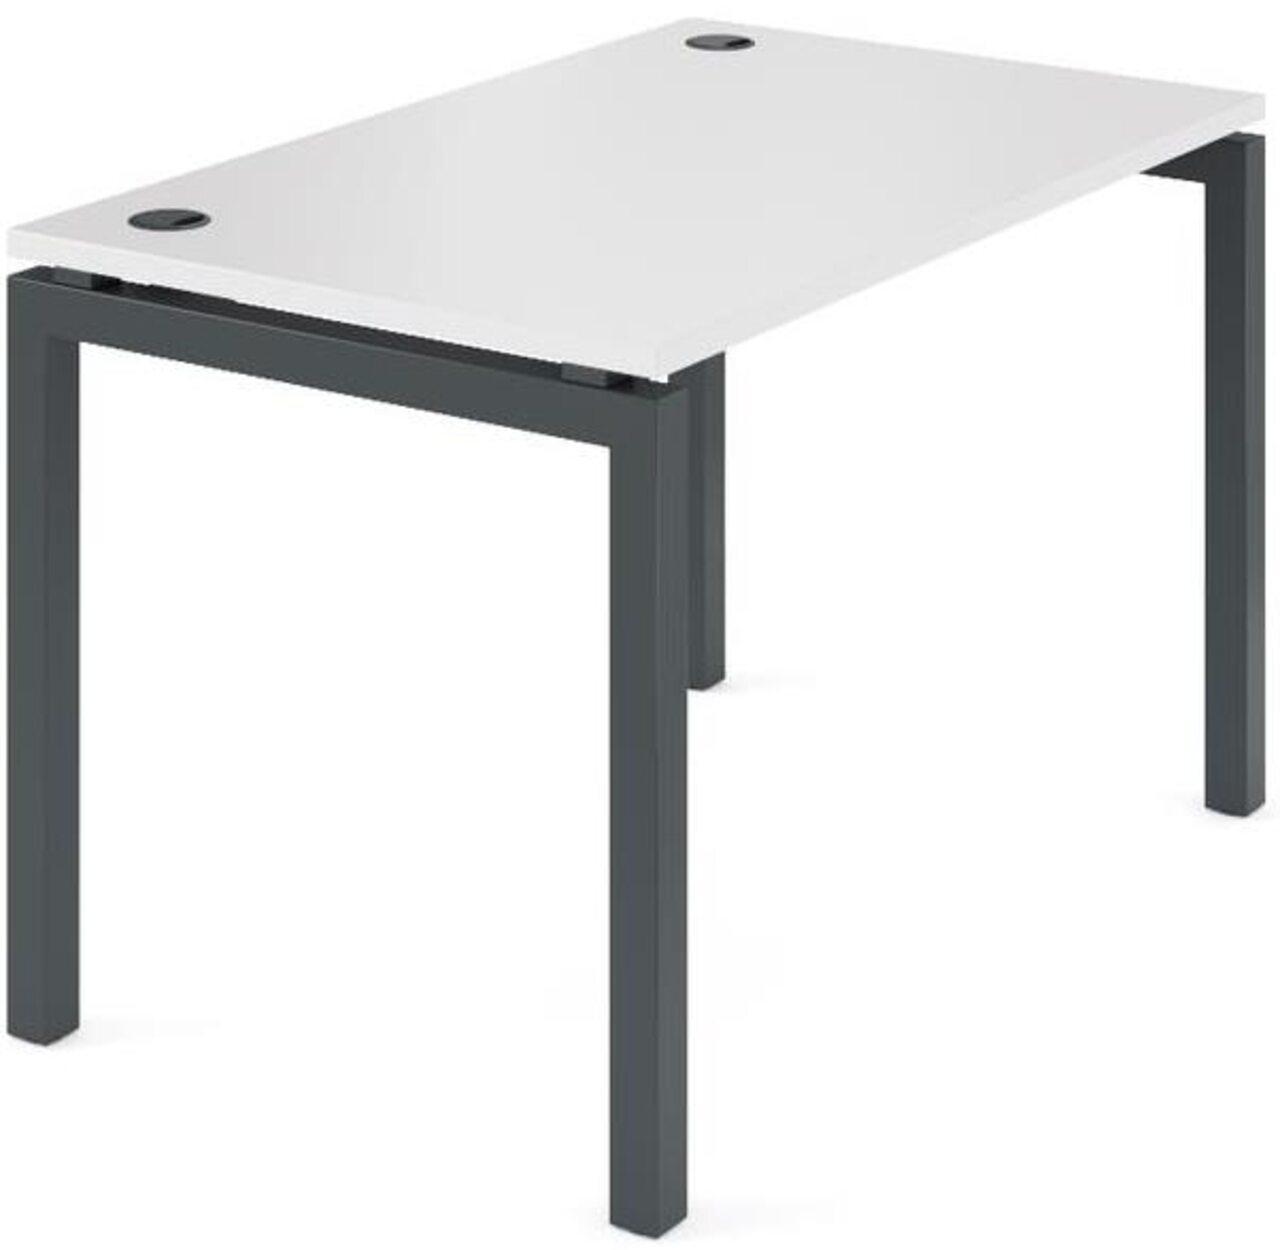 Стол на металлокаркасе  Арго 120x73x76 - фото 4